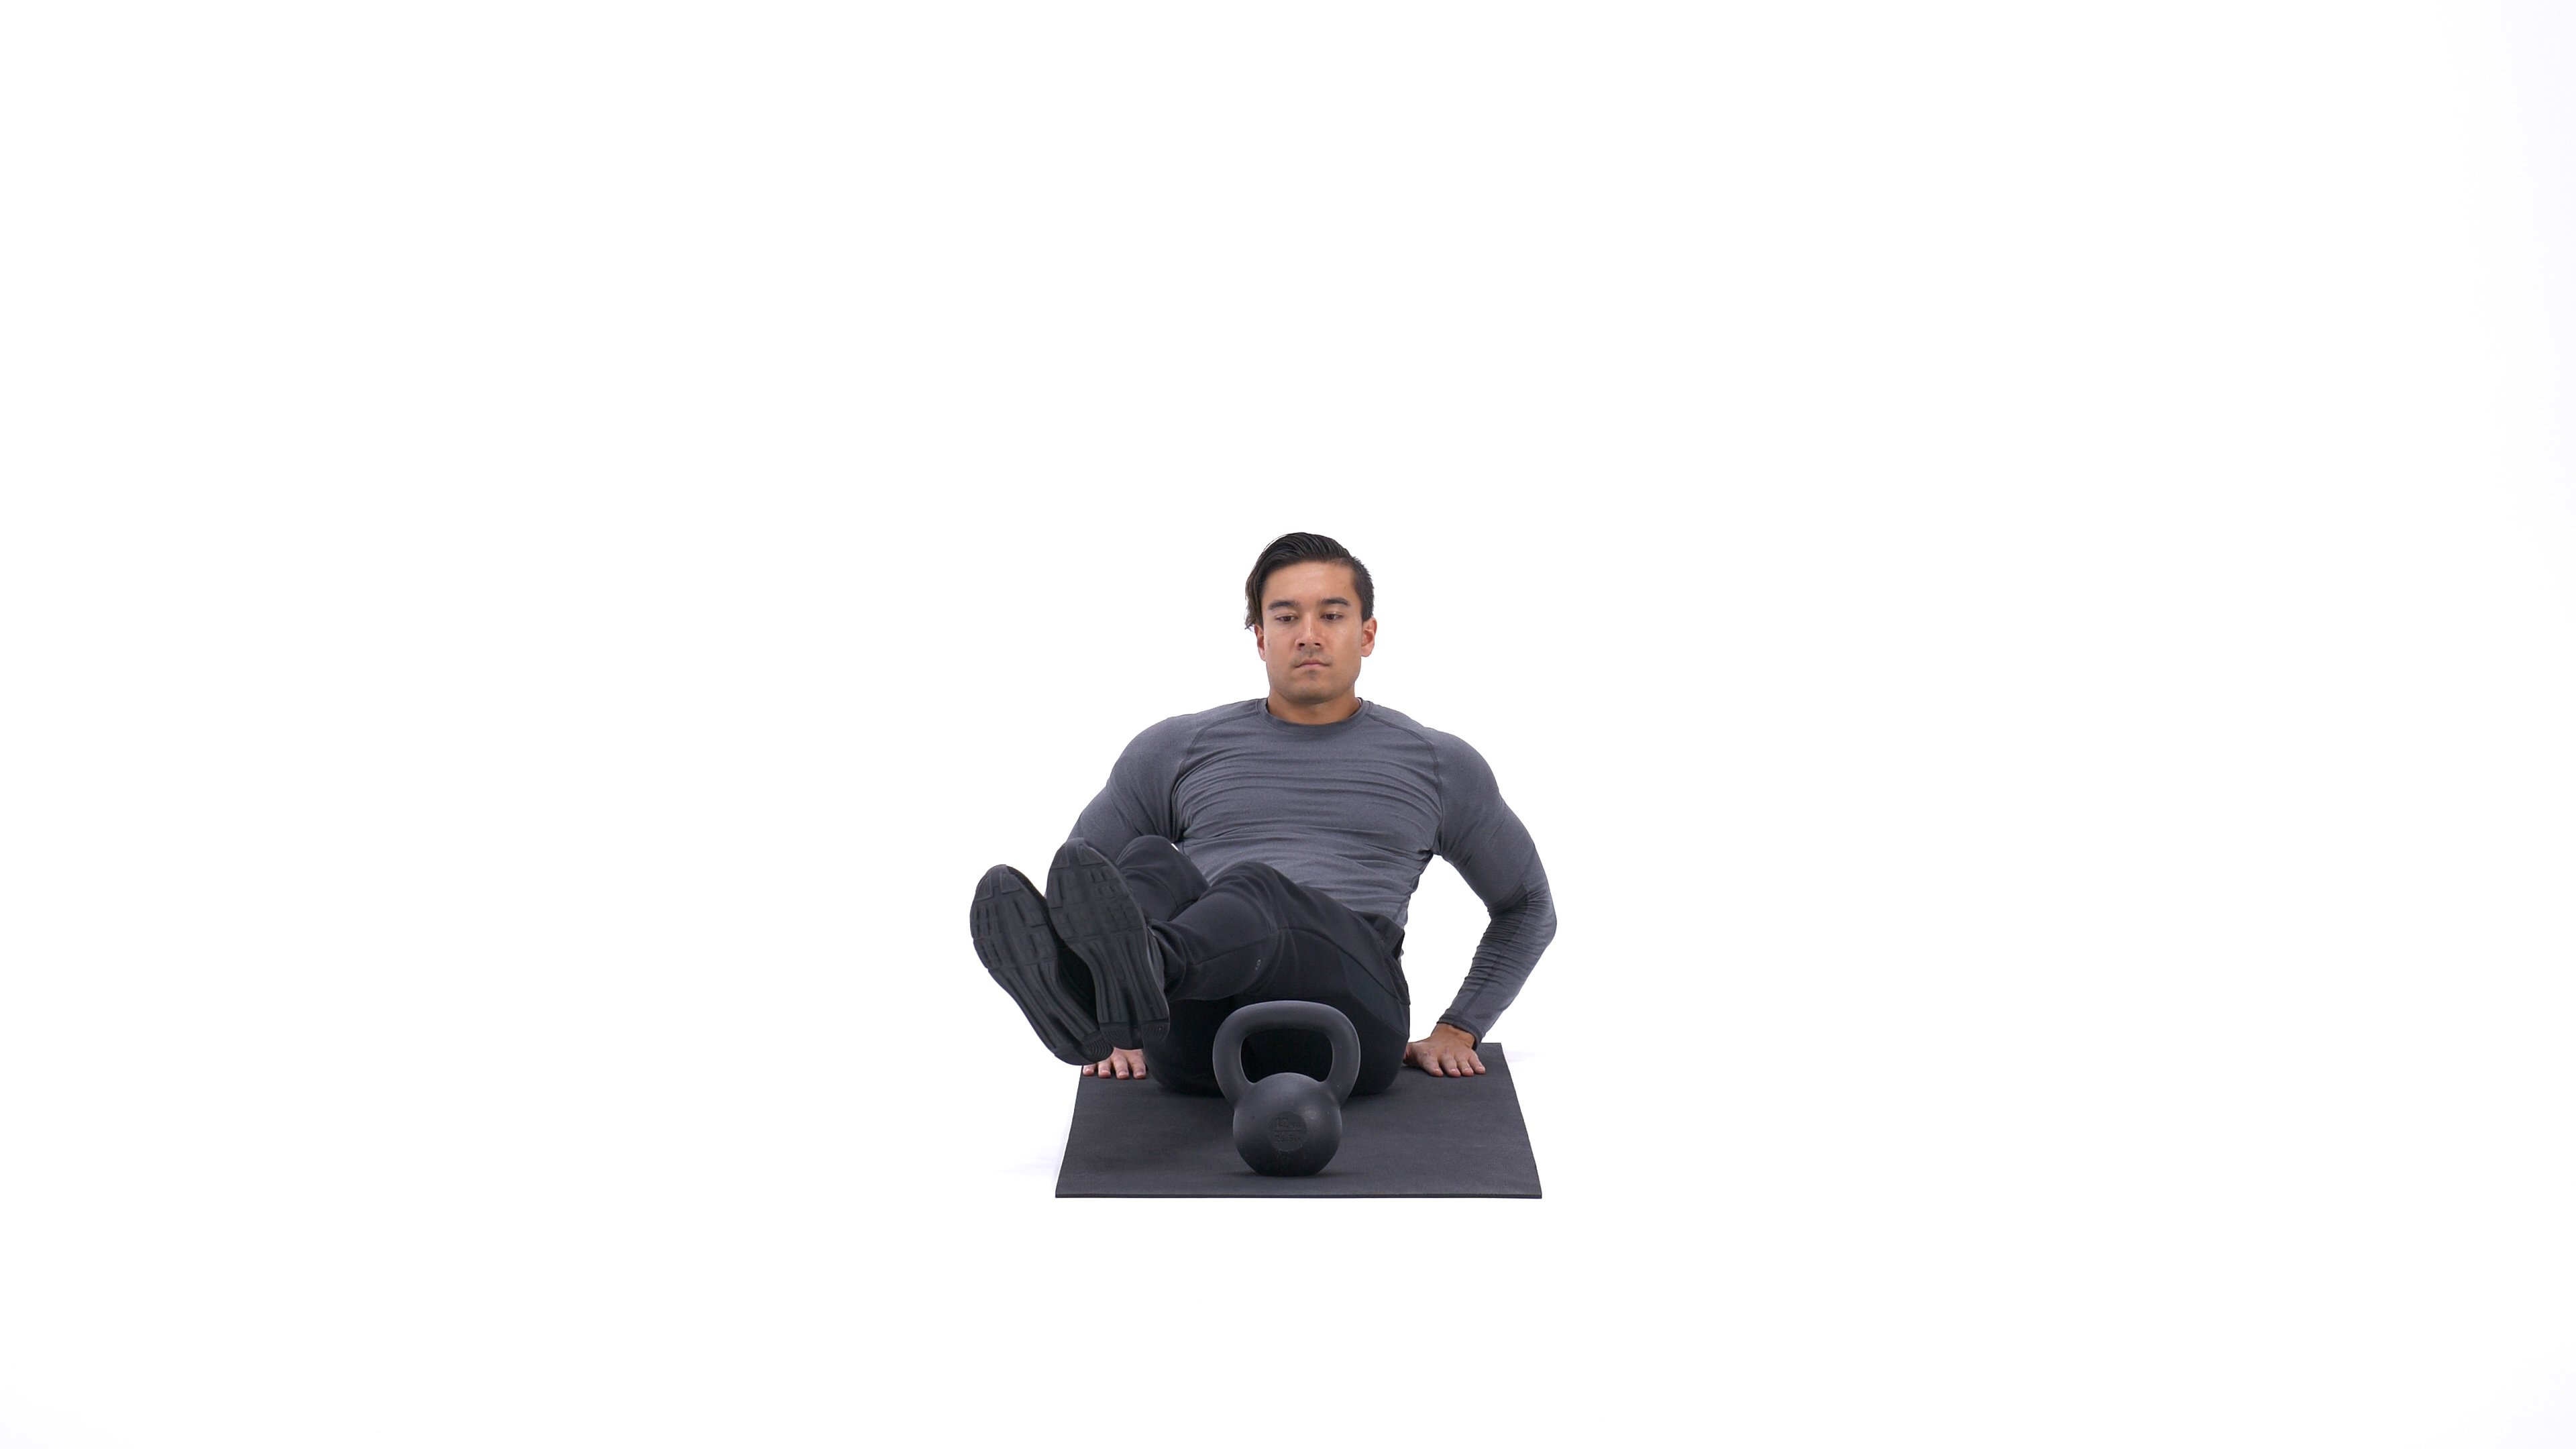 Kettlebell 3-point leg extension image